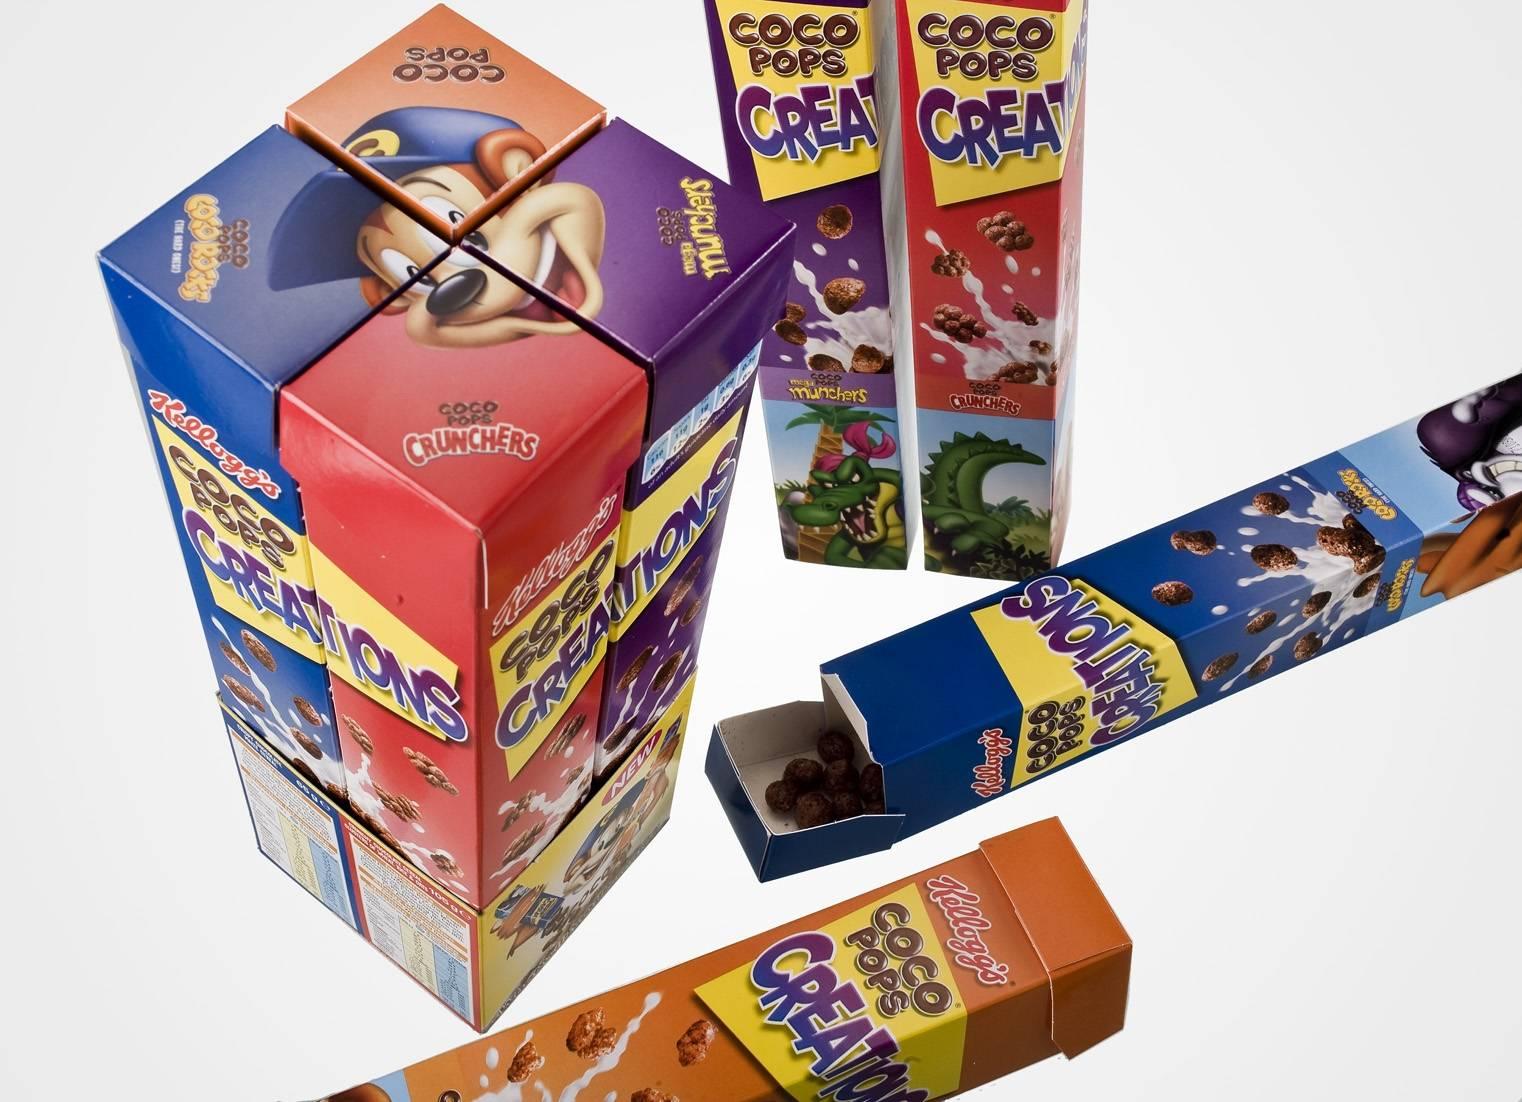 Coco Pop Creations